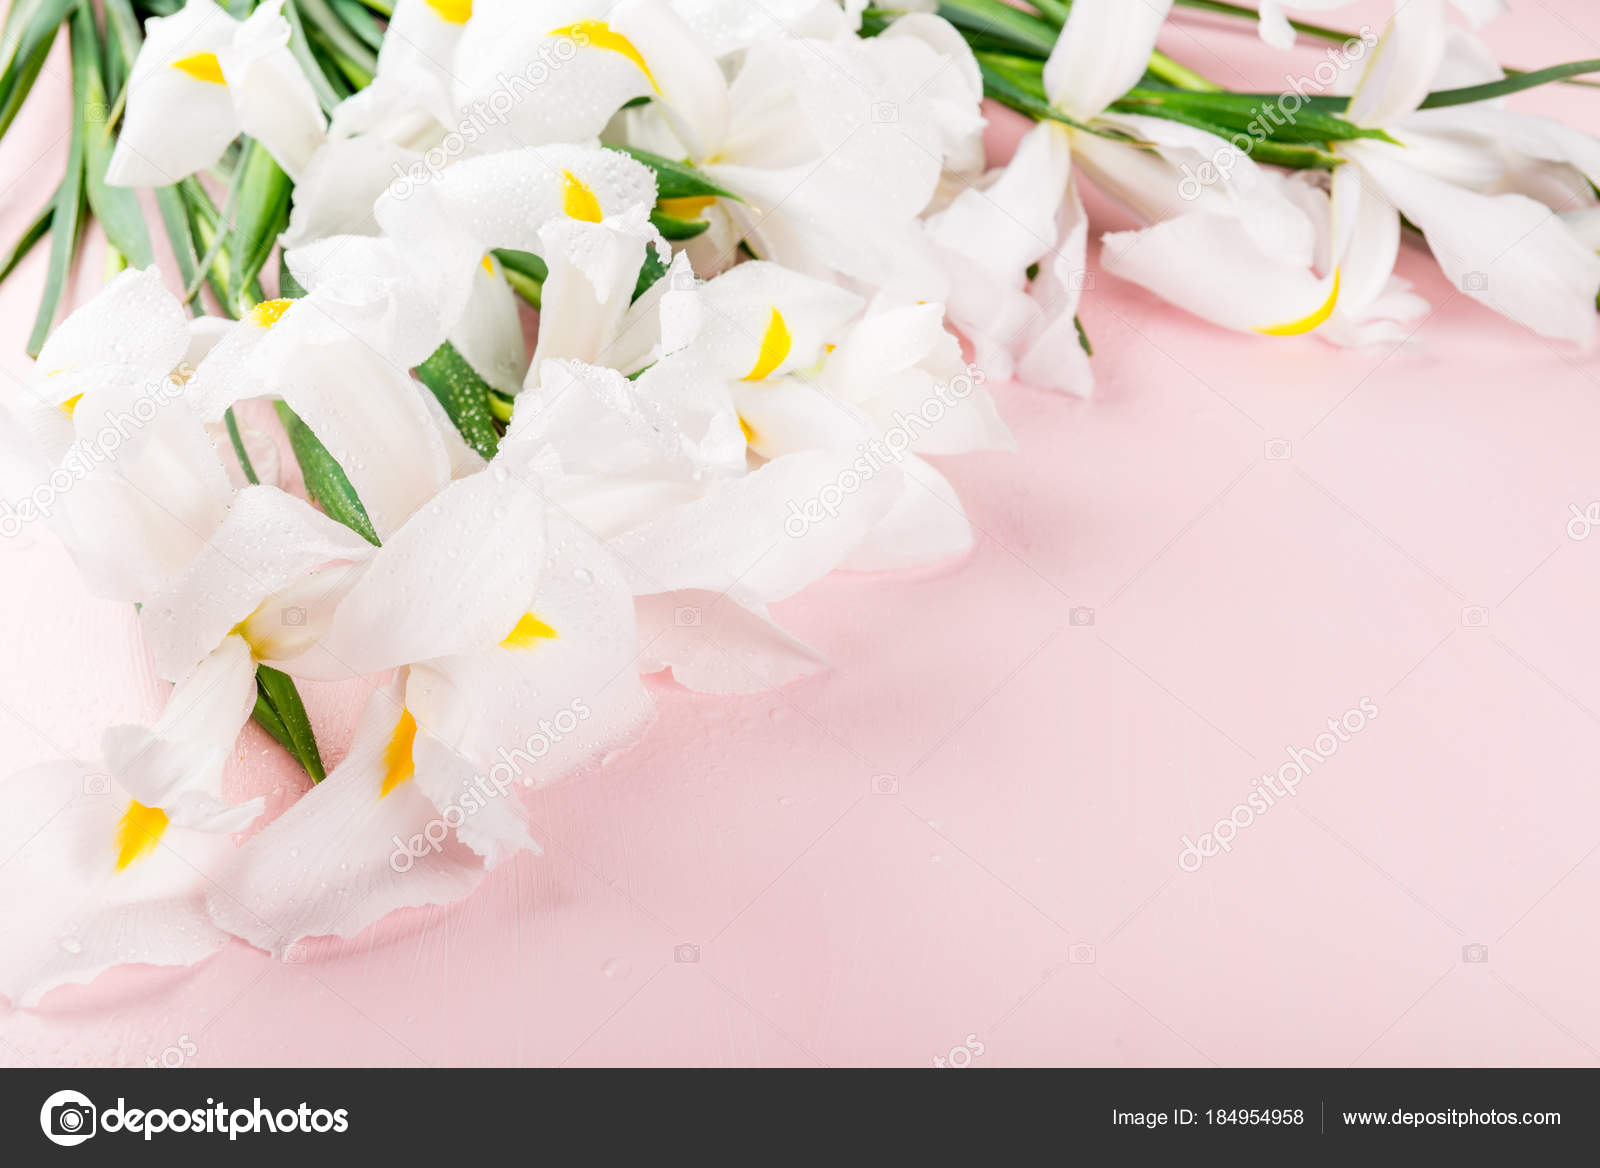 Beautiful white iris flowers on pink background stock photo beautiful white iris flowers on pink background stock photo izmirmasajfo